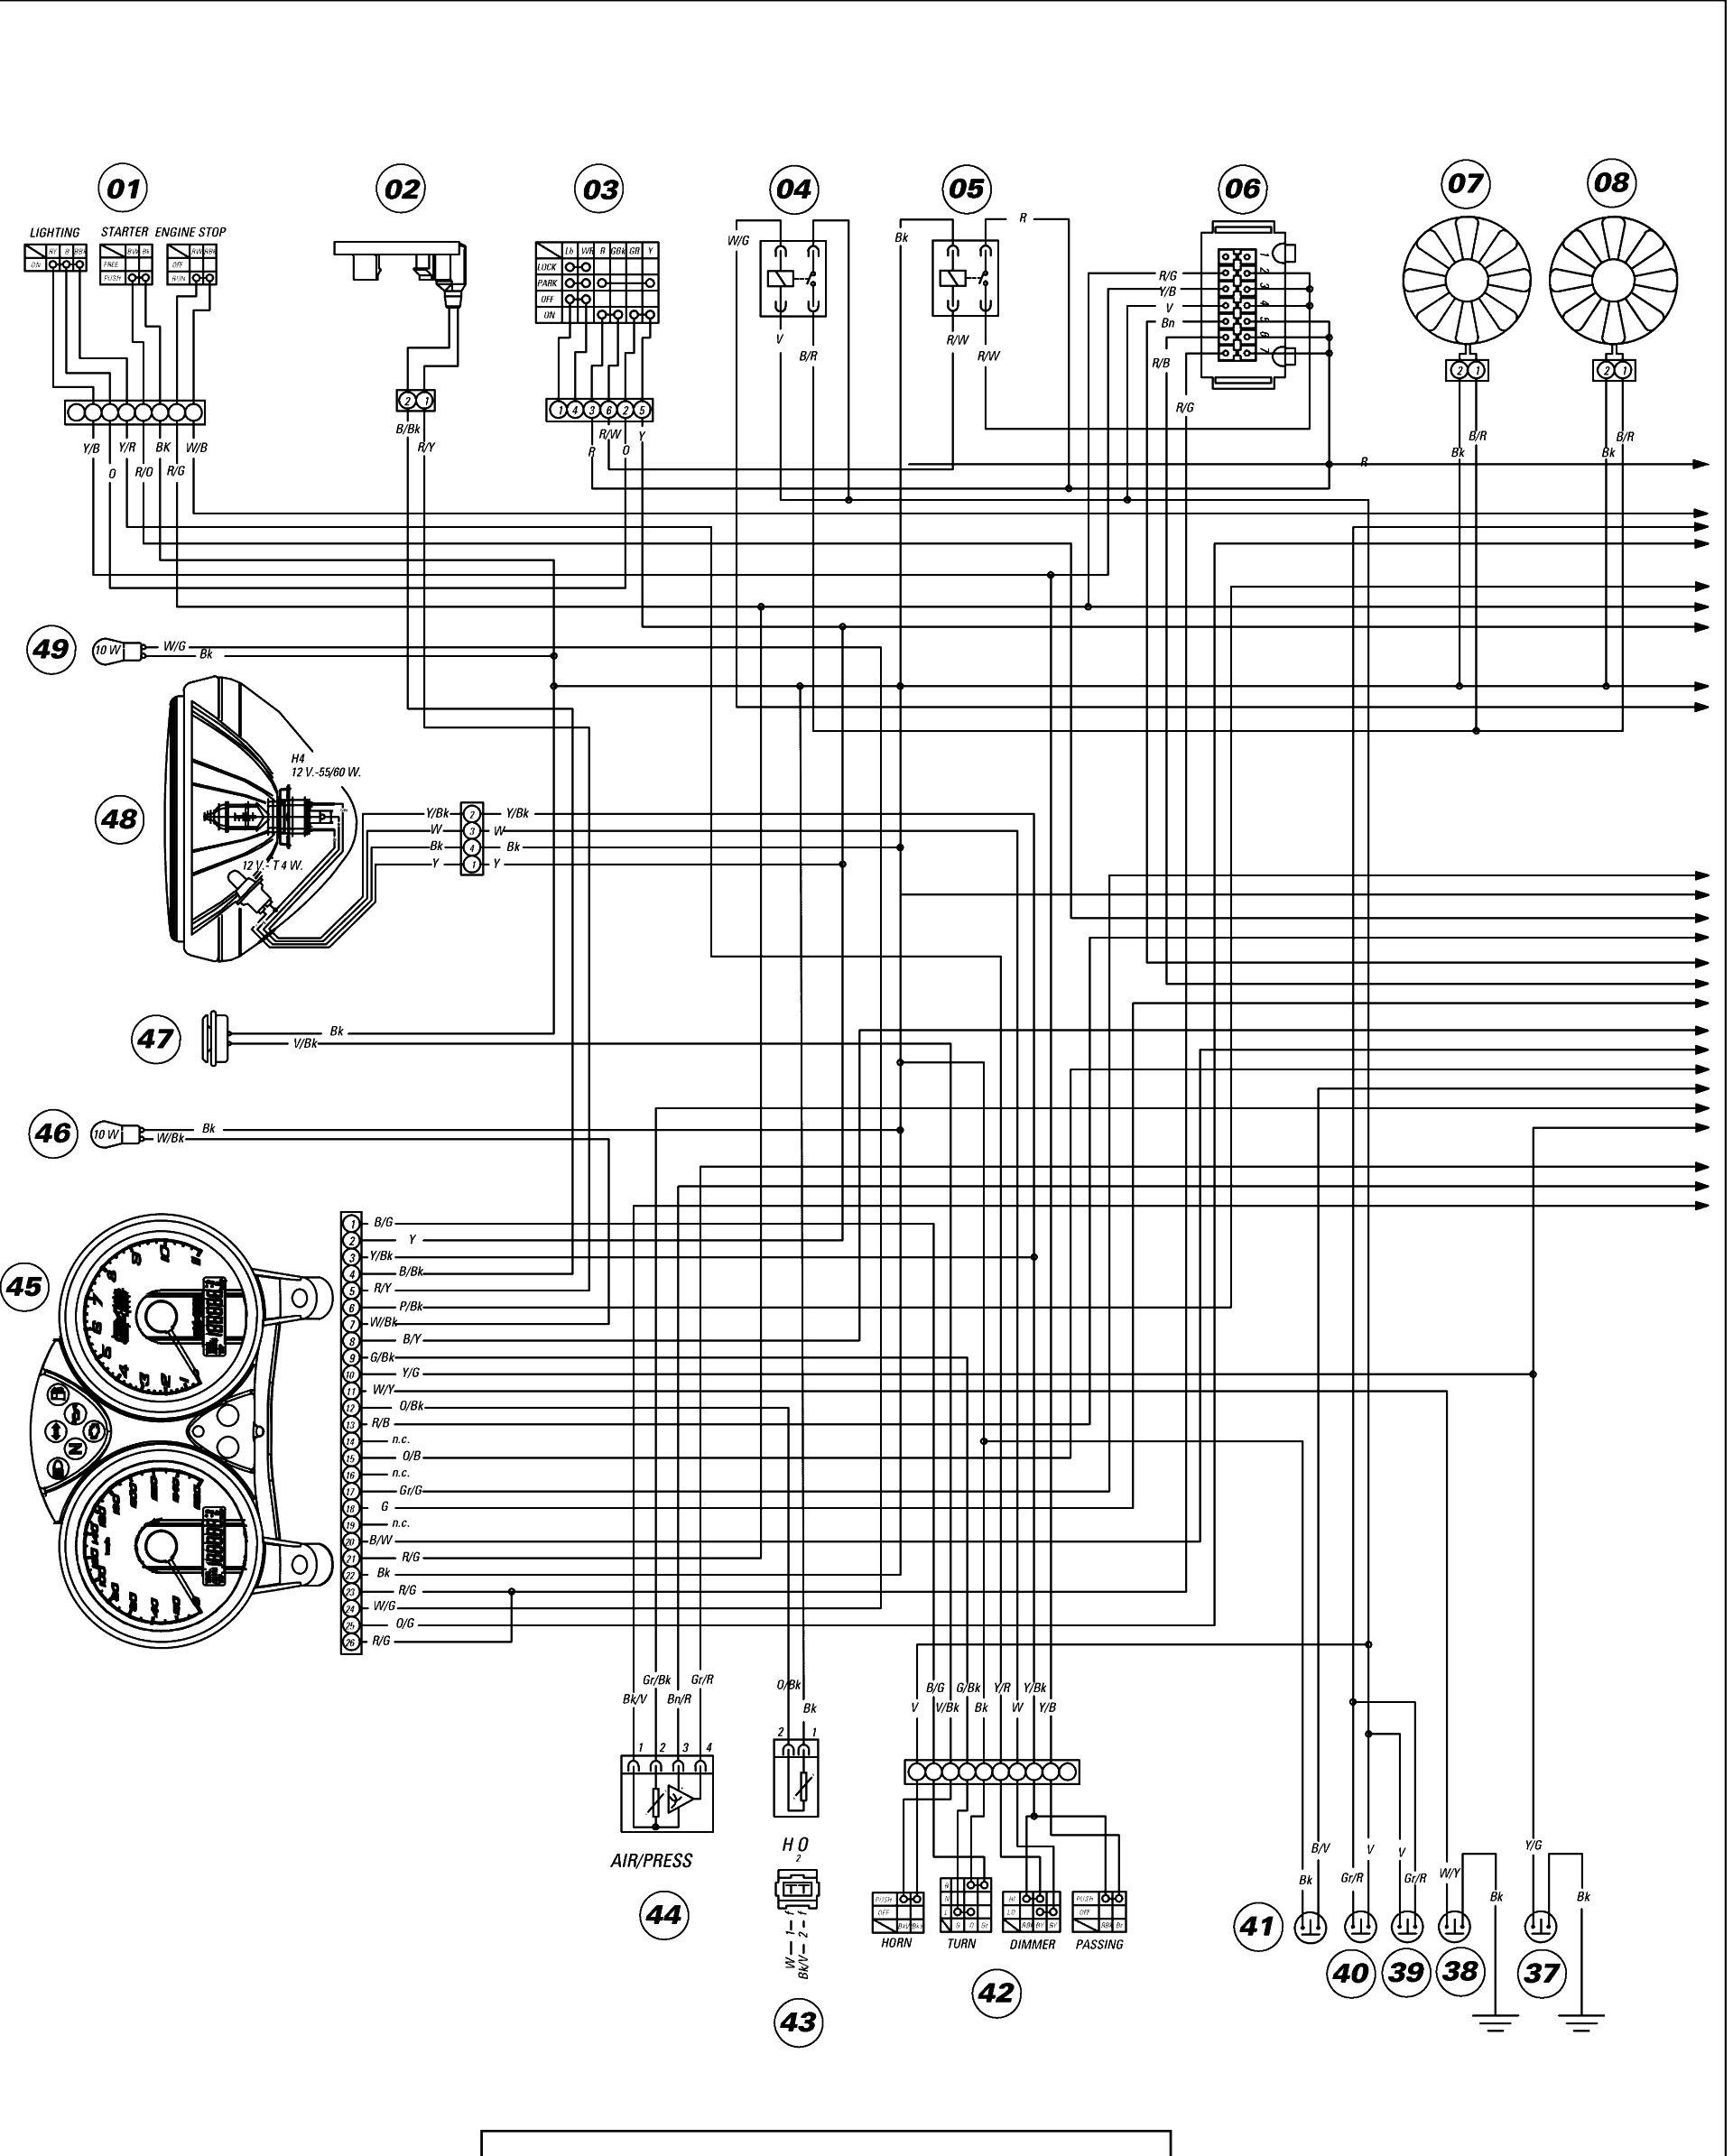 Fantastic Ducati Monster S4R 2004 Wiring Diagram Wiring Diagram Data Schema Wiring 101 Akebretraxxcnl